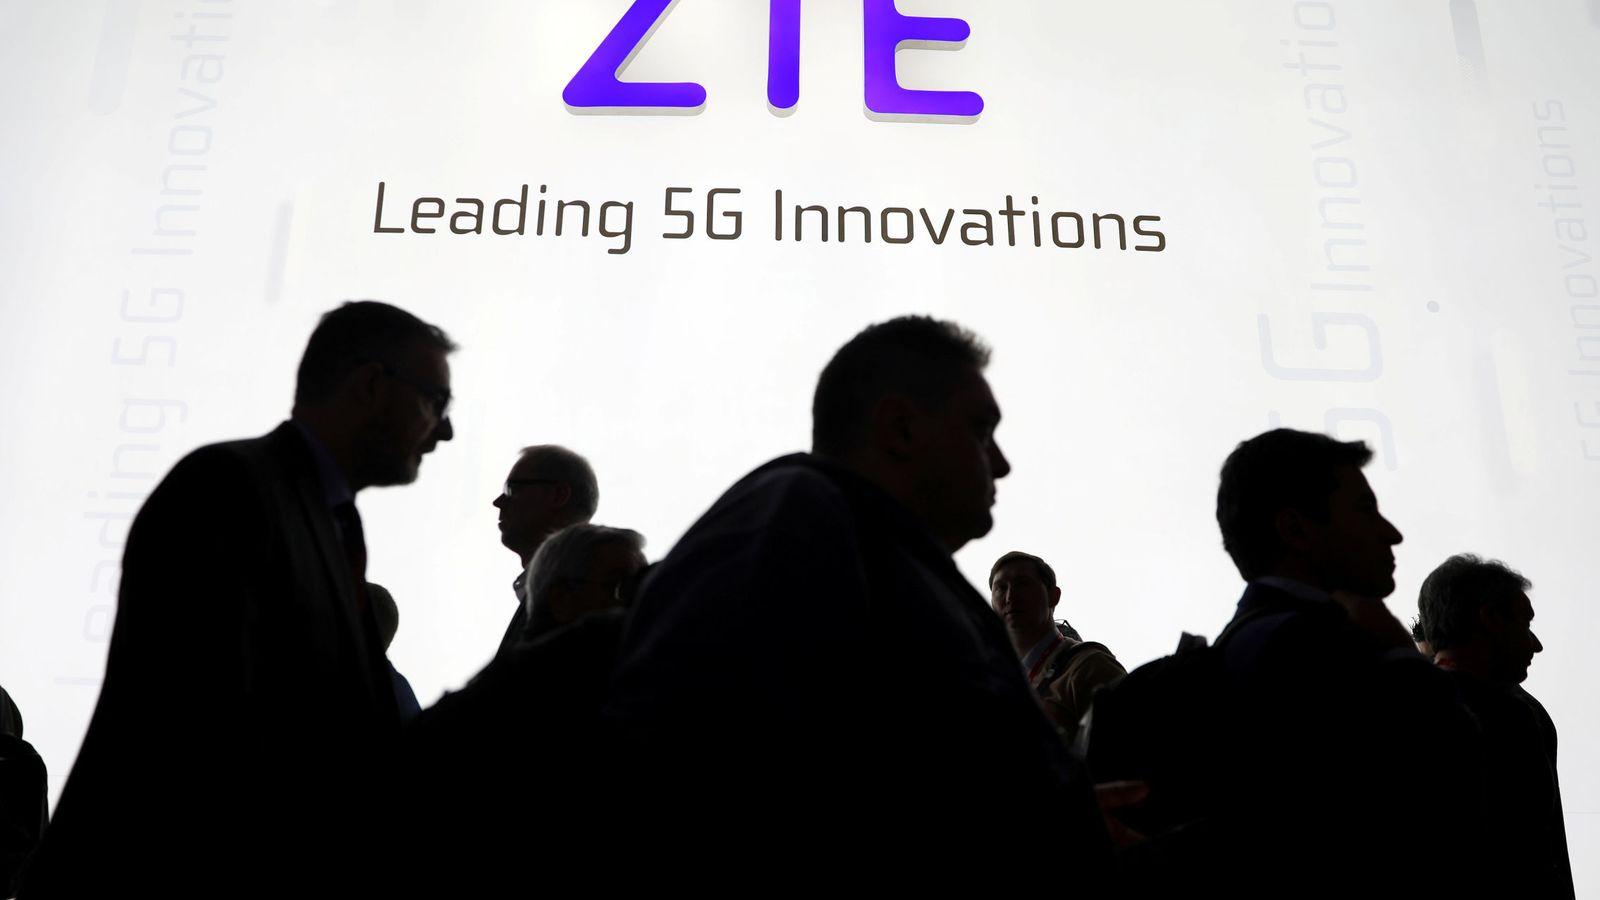 Foto: Logotipo de la tecnológica china ZTE